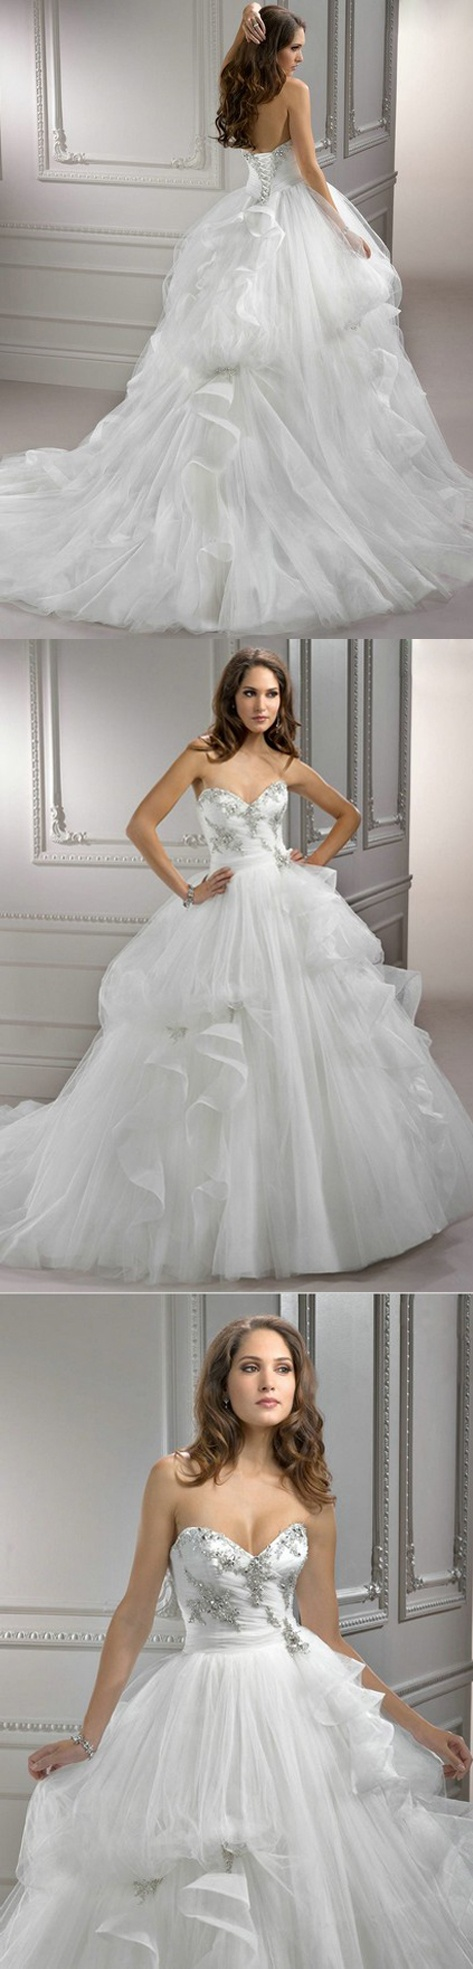 White Tulle Romantic Silver Stones 2013 Design Ball Gown Corset Top Wedding Dress $209.99